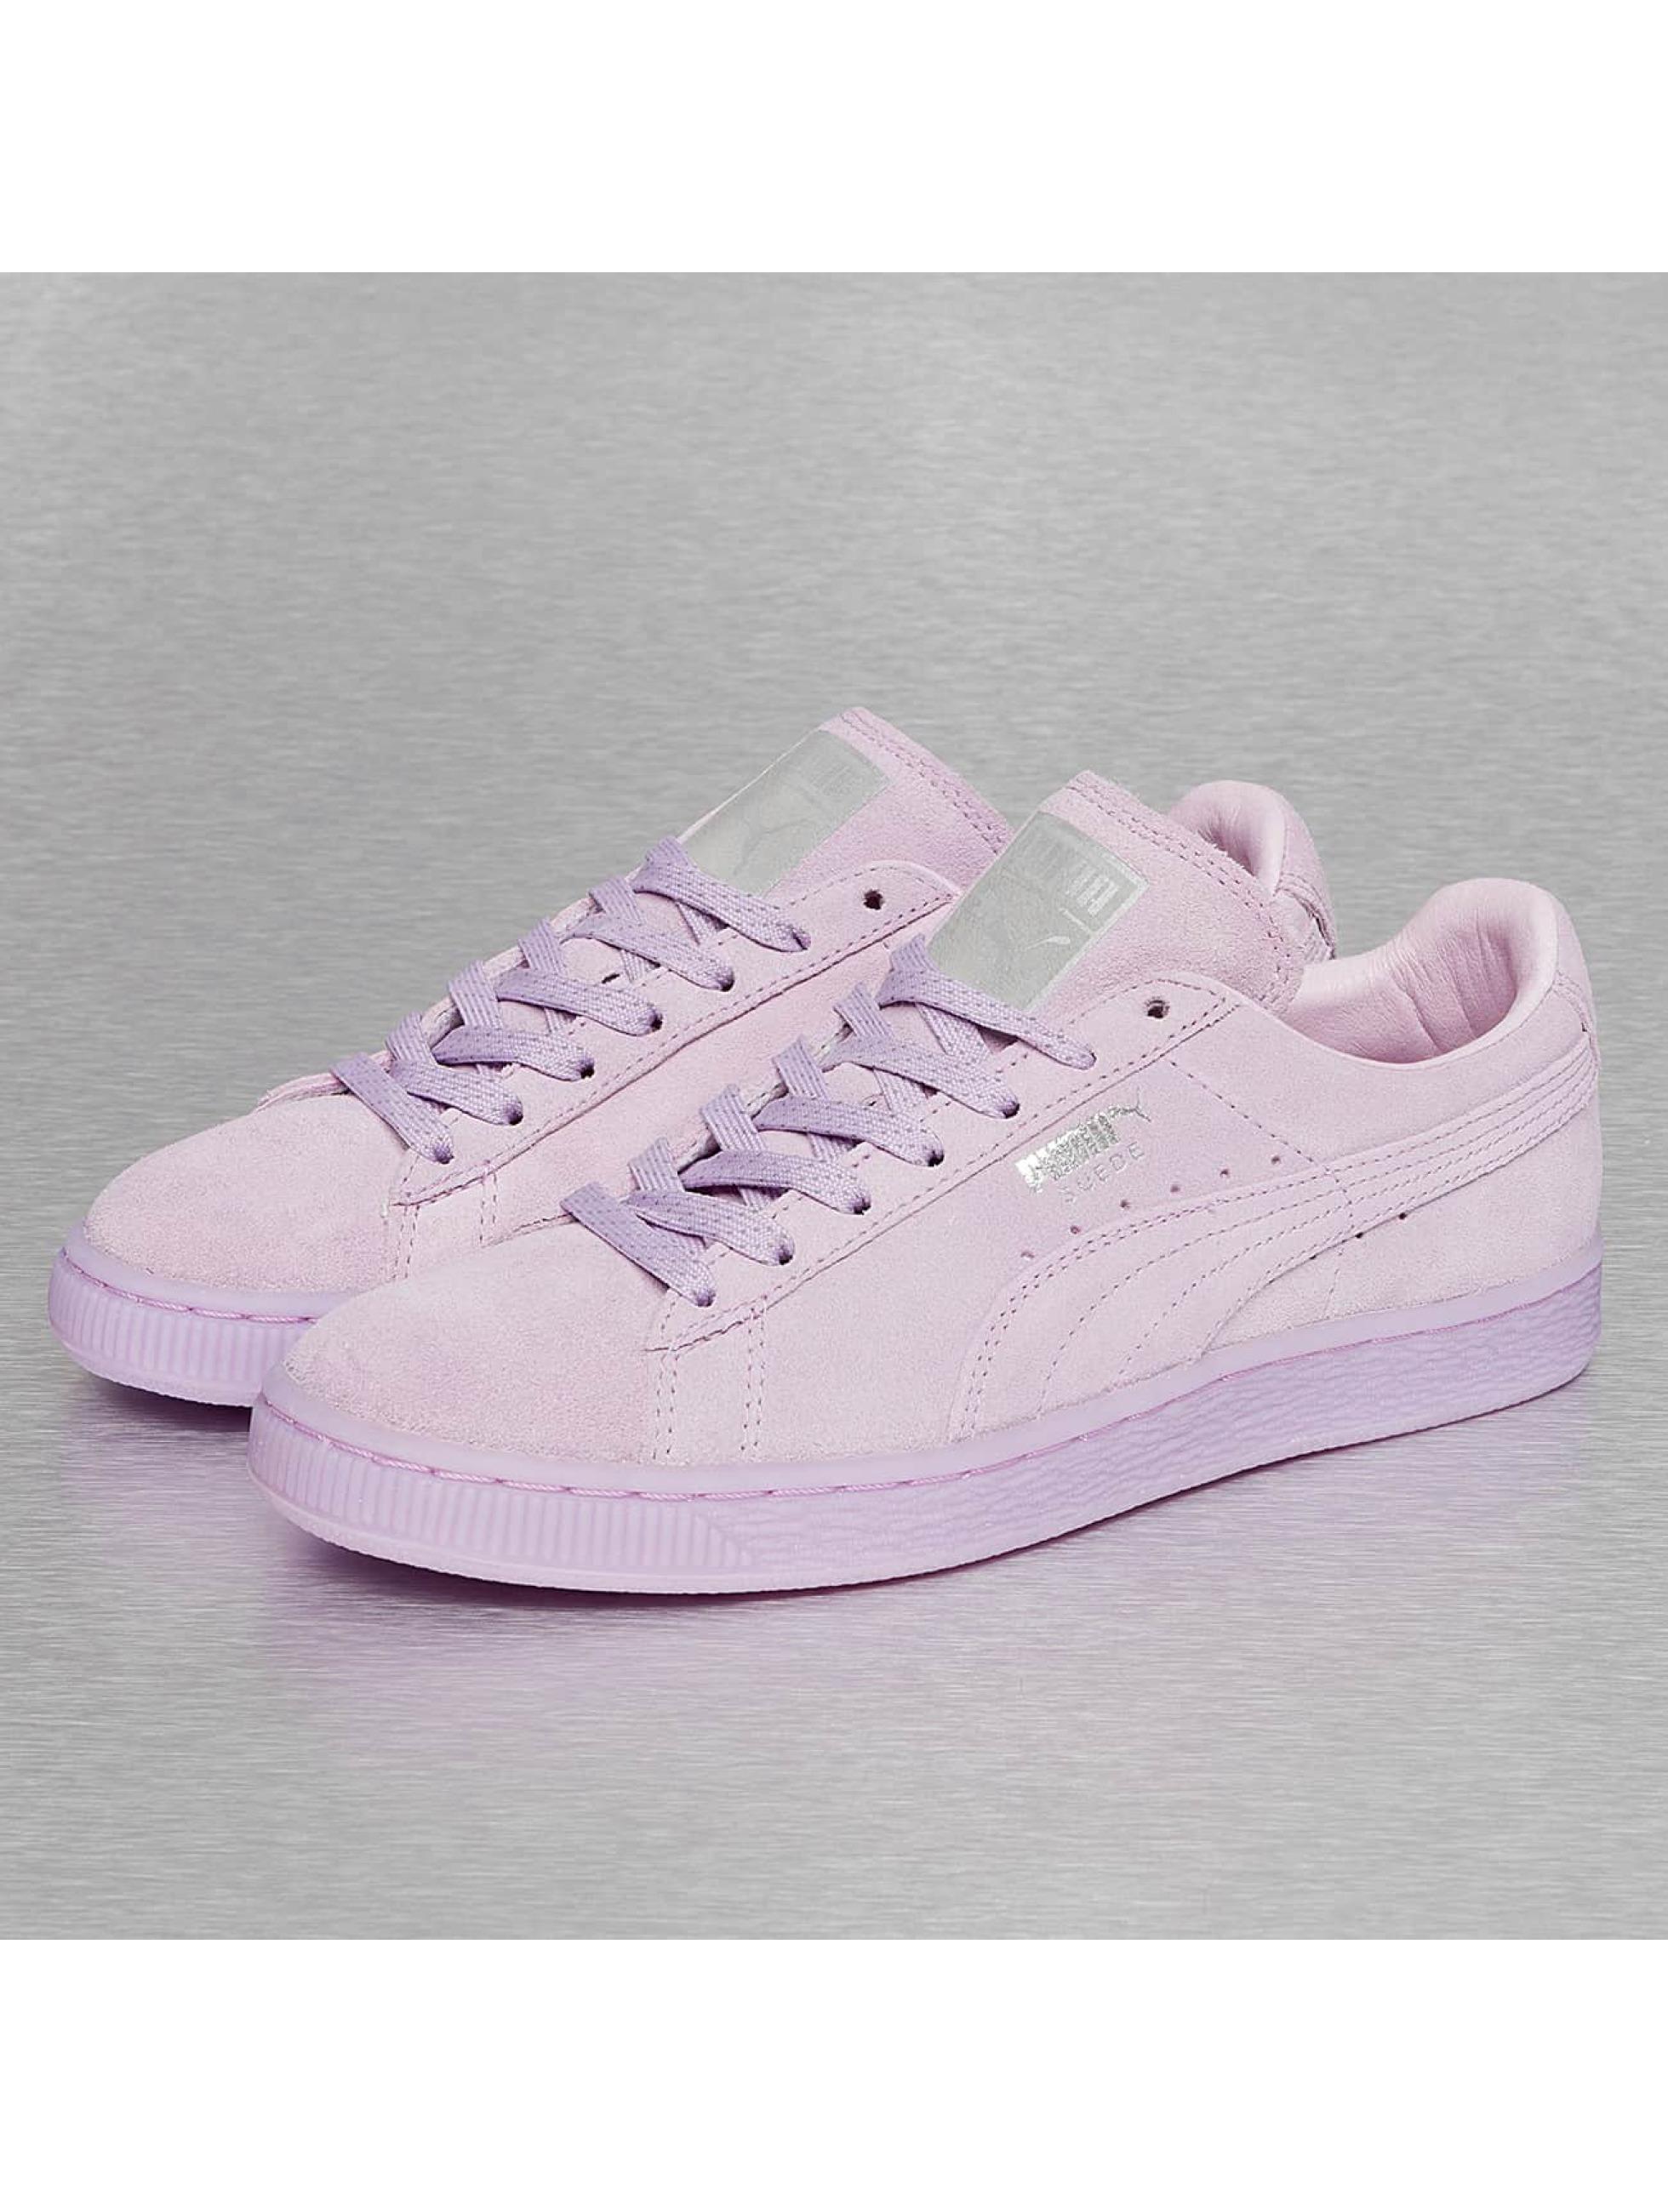 Puma schoen / sneaker Suede Classic Mono Ref Iced in paars